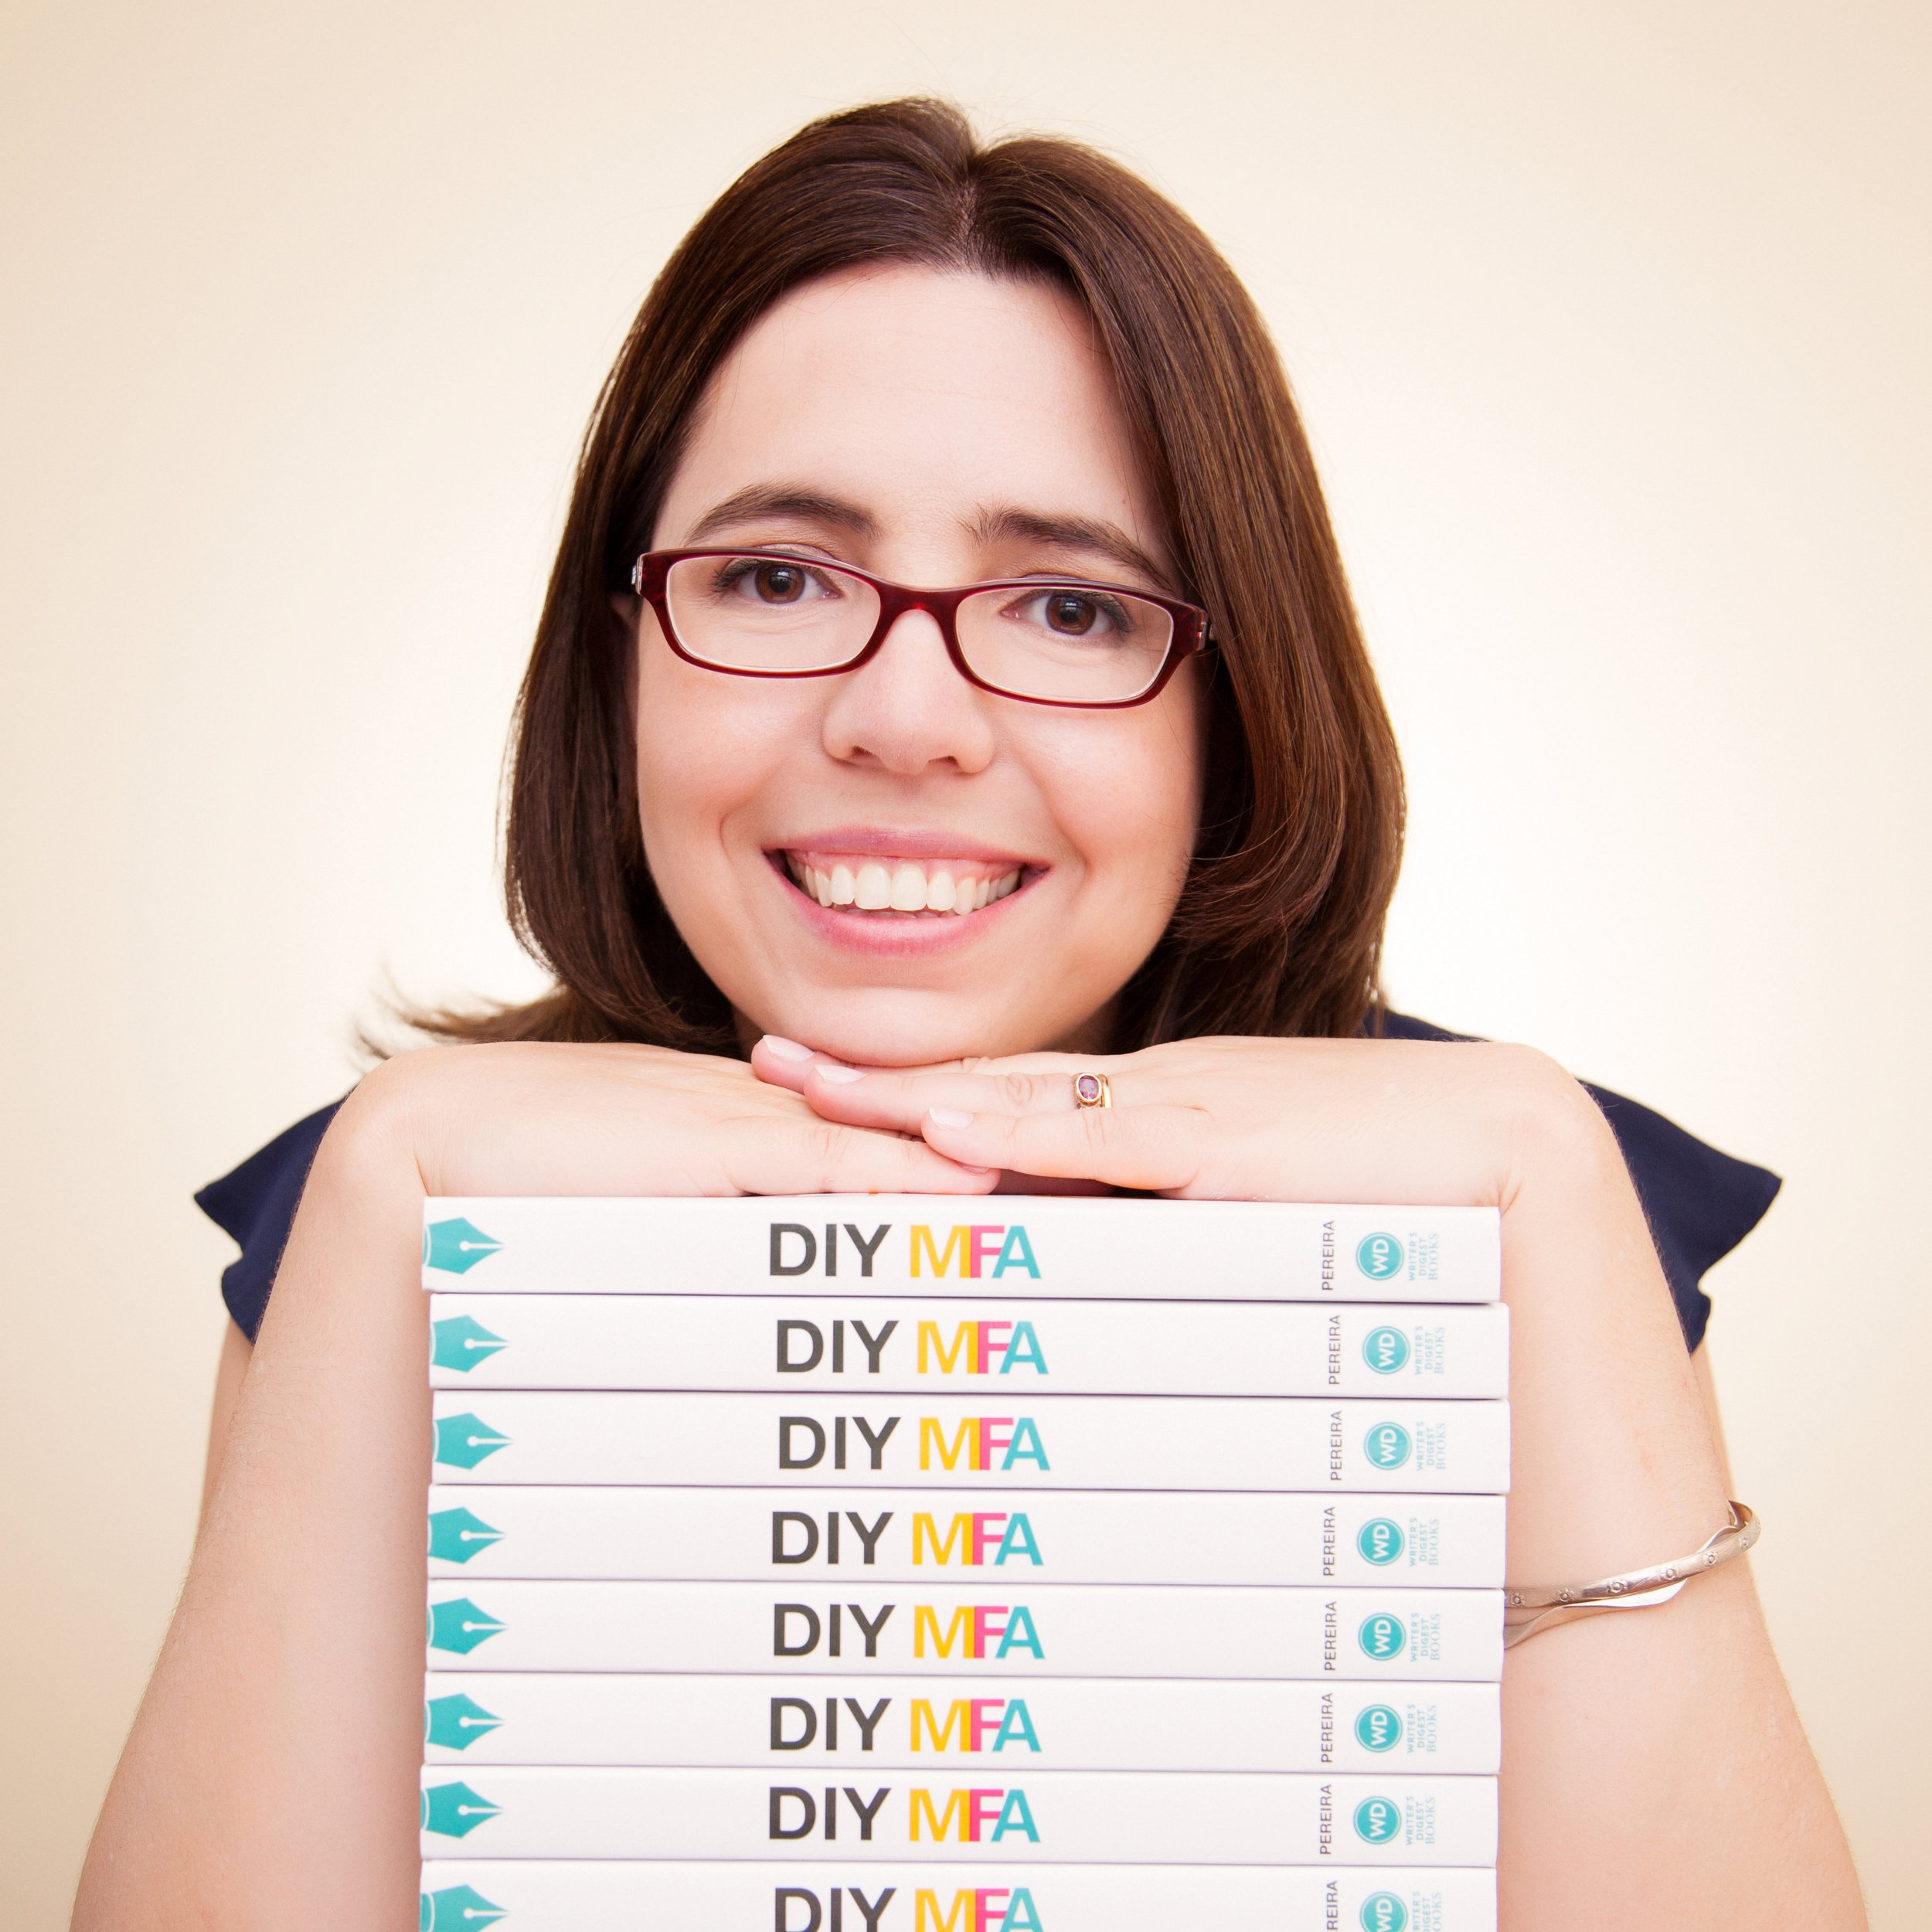 Gabriela Perera - founder of DIYMFA.com, podcast host for DIY MFA Radio, and author of DIY MFA: Write with Focus, Read with Purpose, Build Your Community